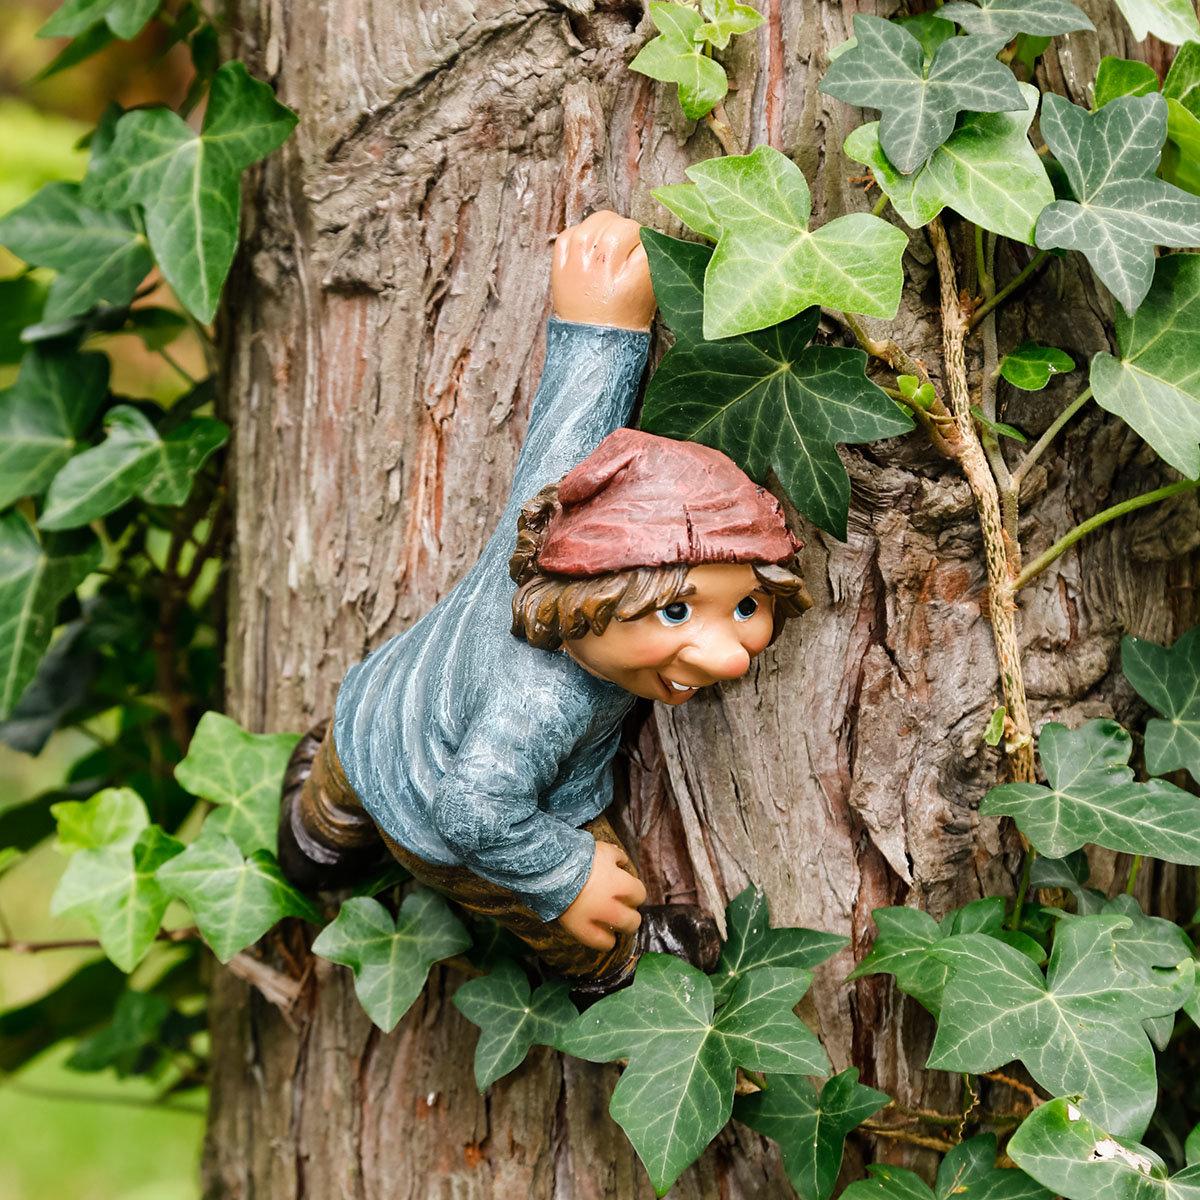 Gartenfigur Kletter-Gnom Tarzan